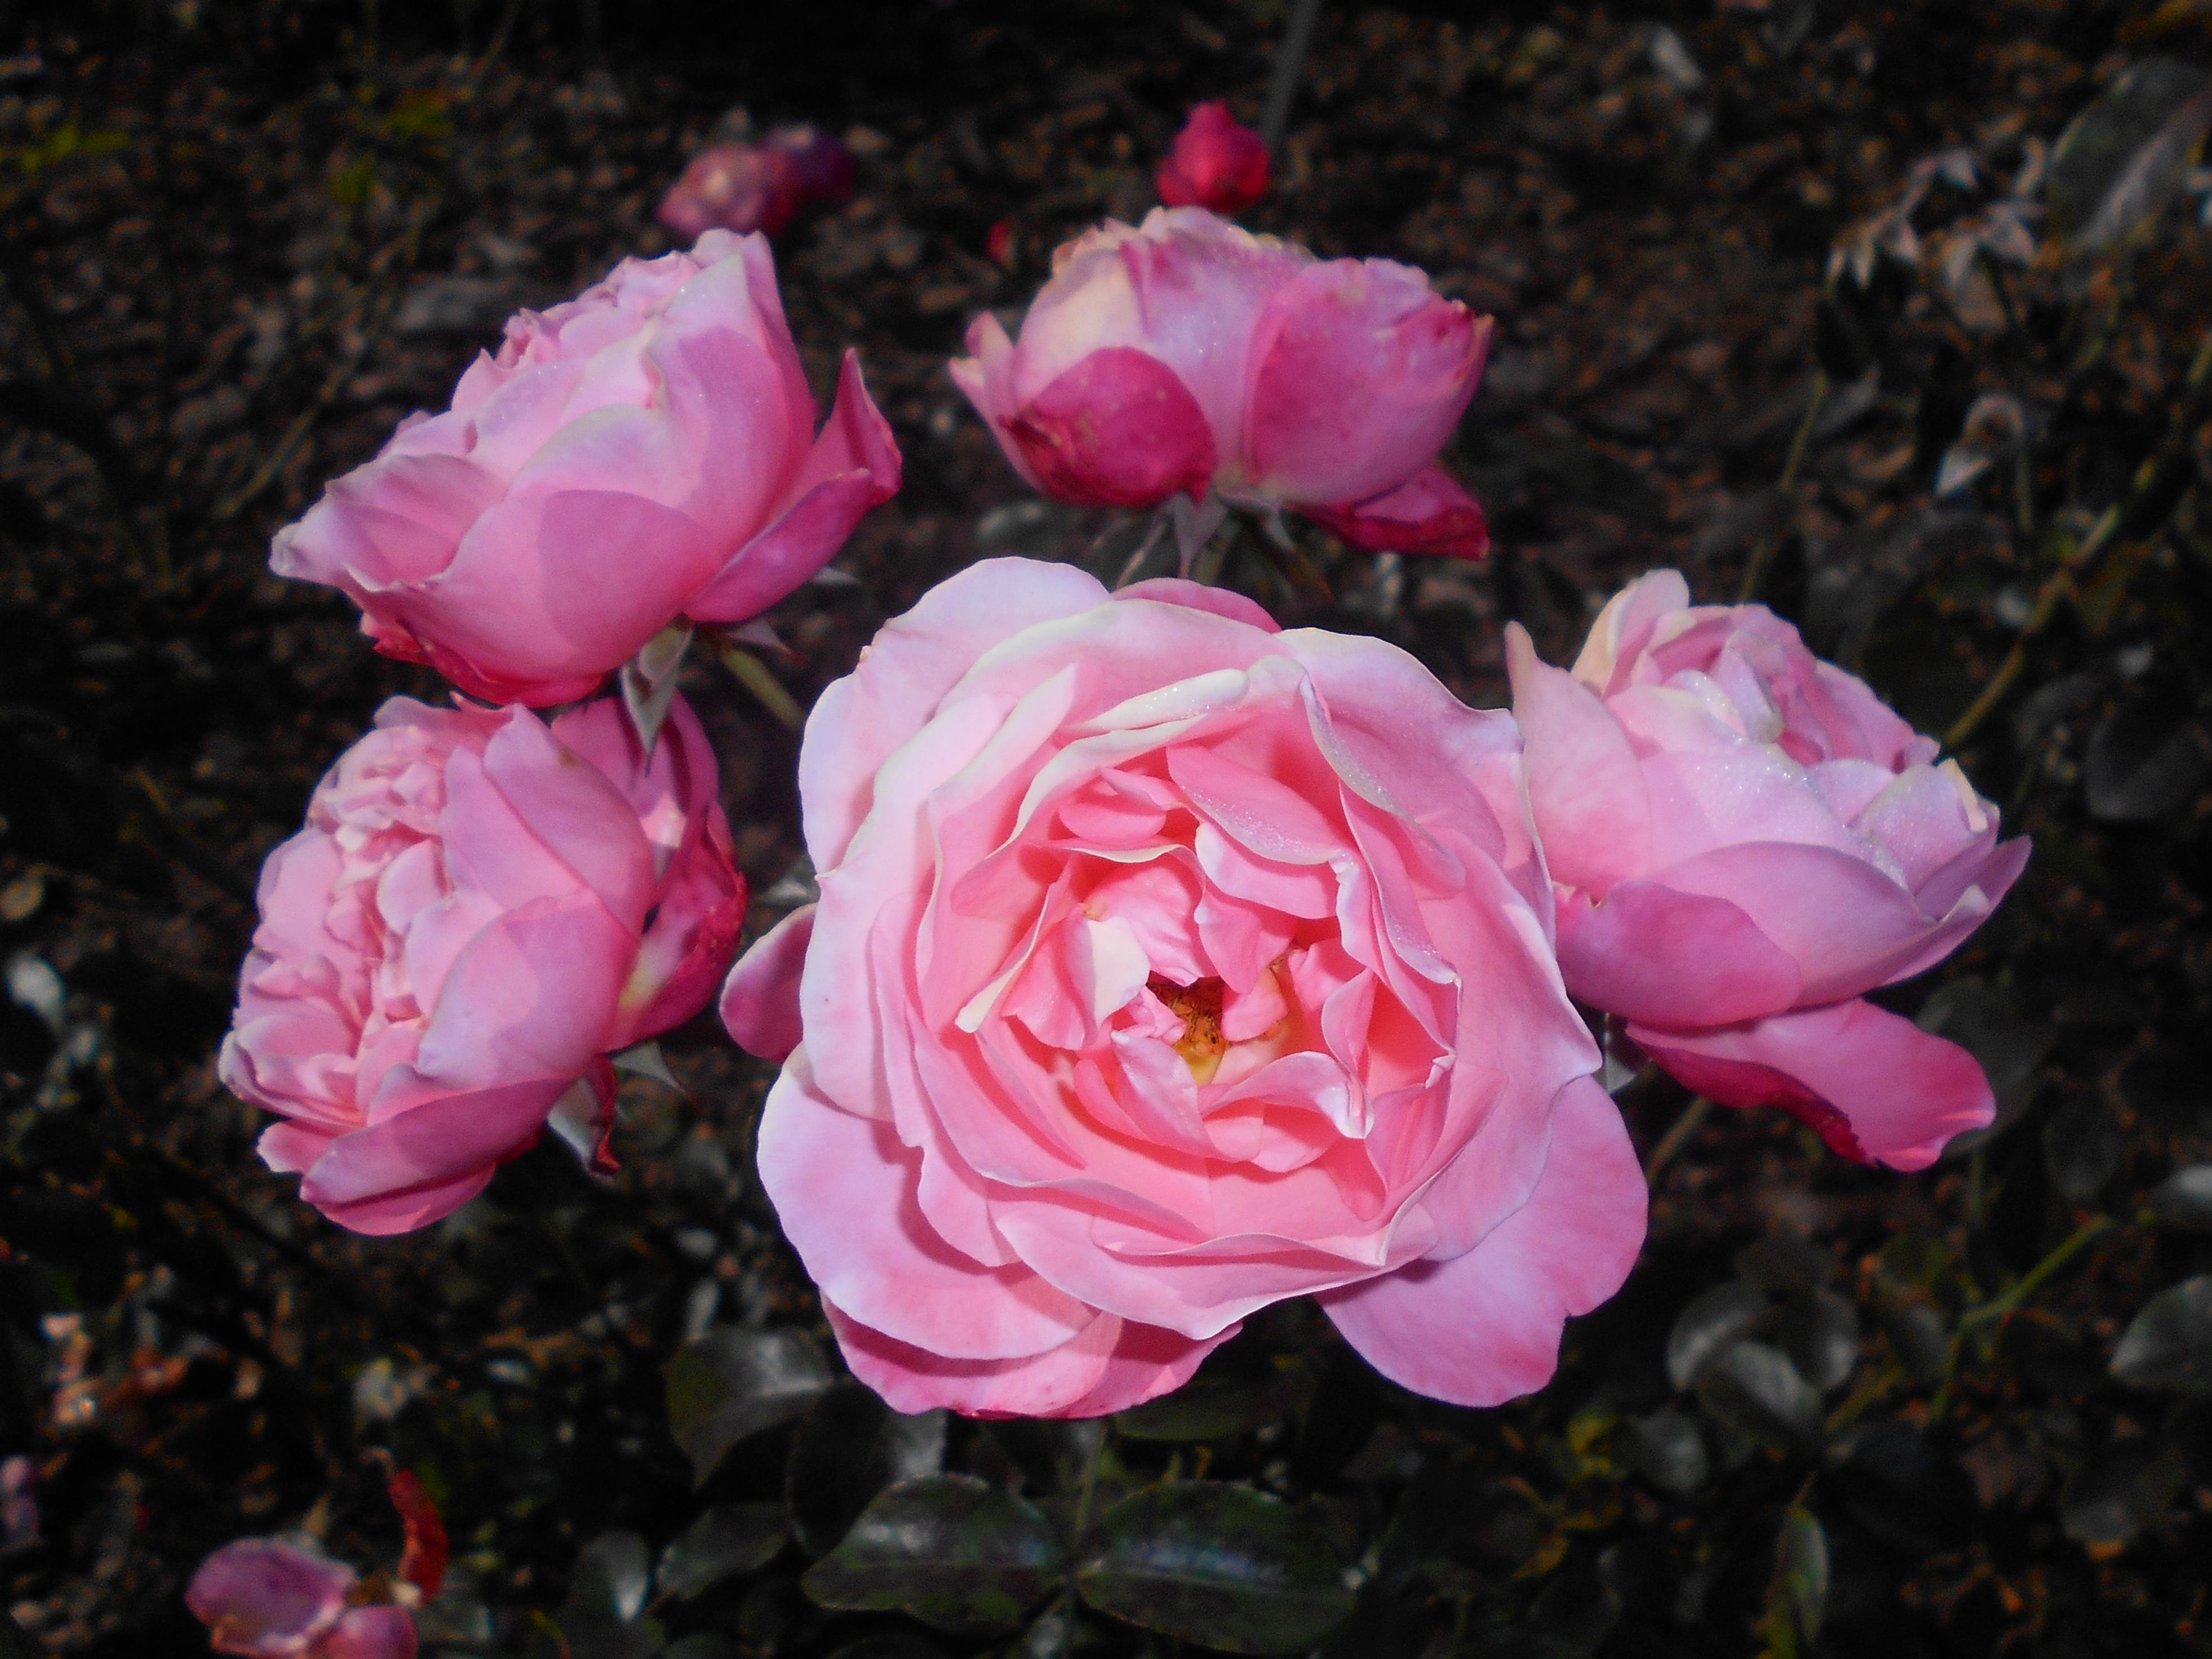 Filerosa Mein Schoner Garten 2017 10 02 6761jpg Wikimedia Commons